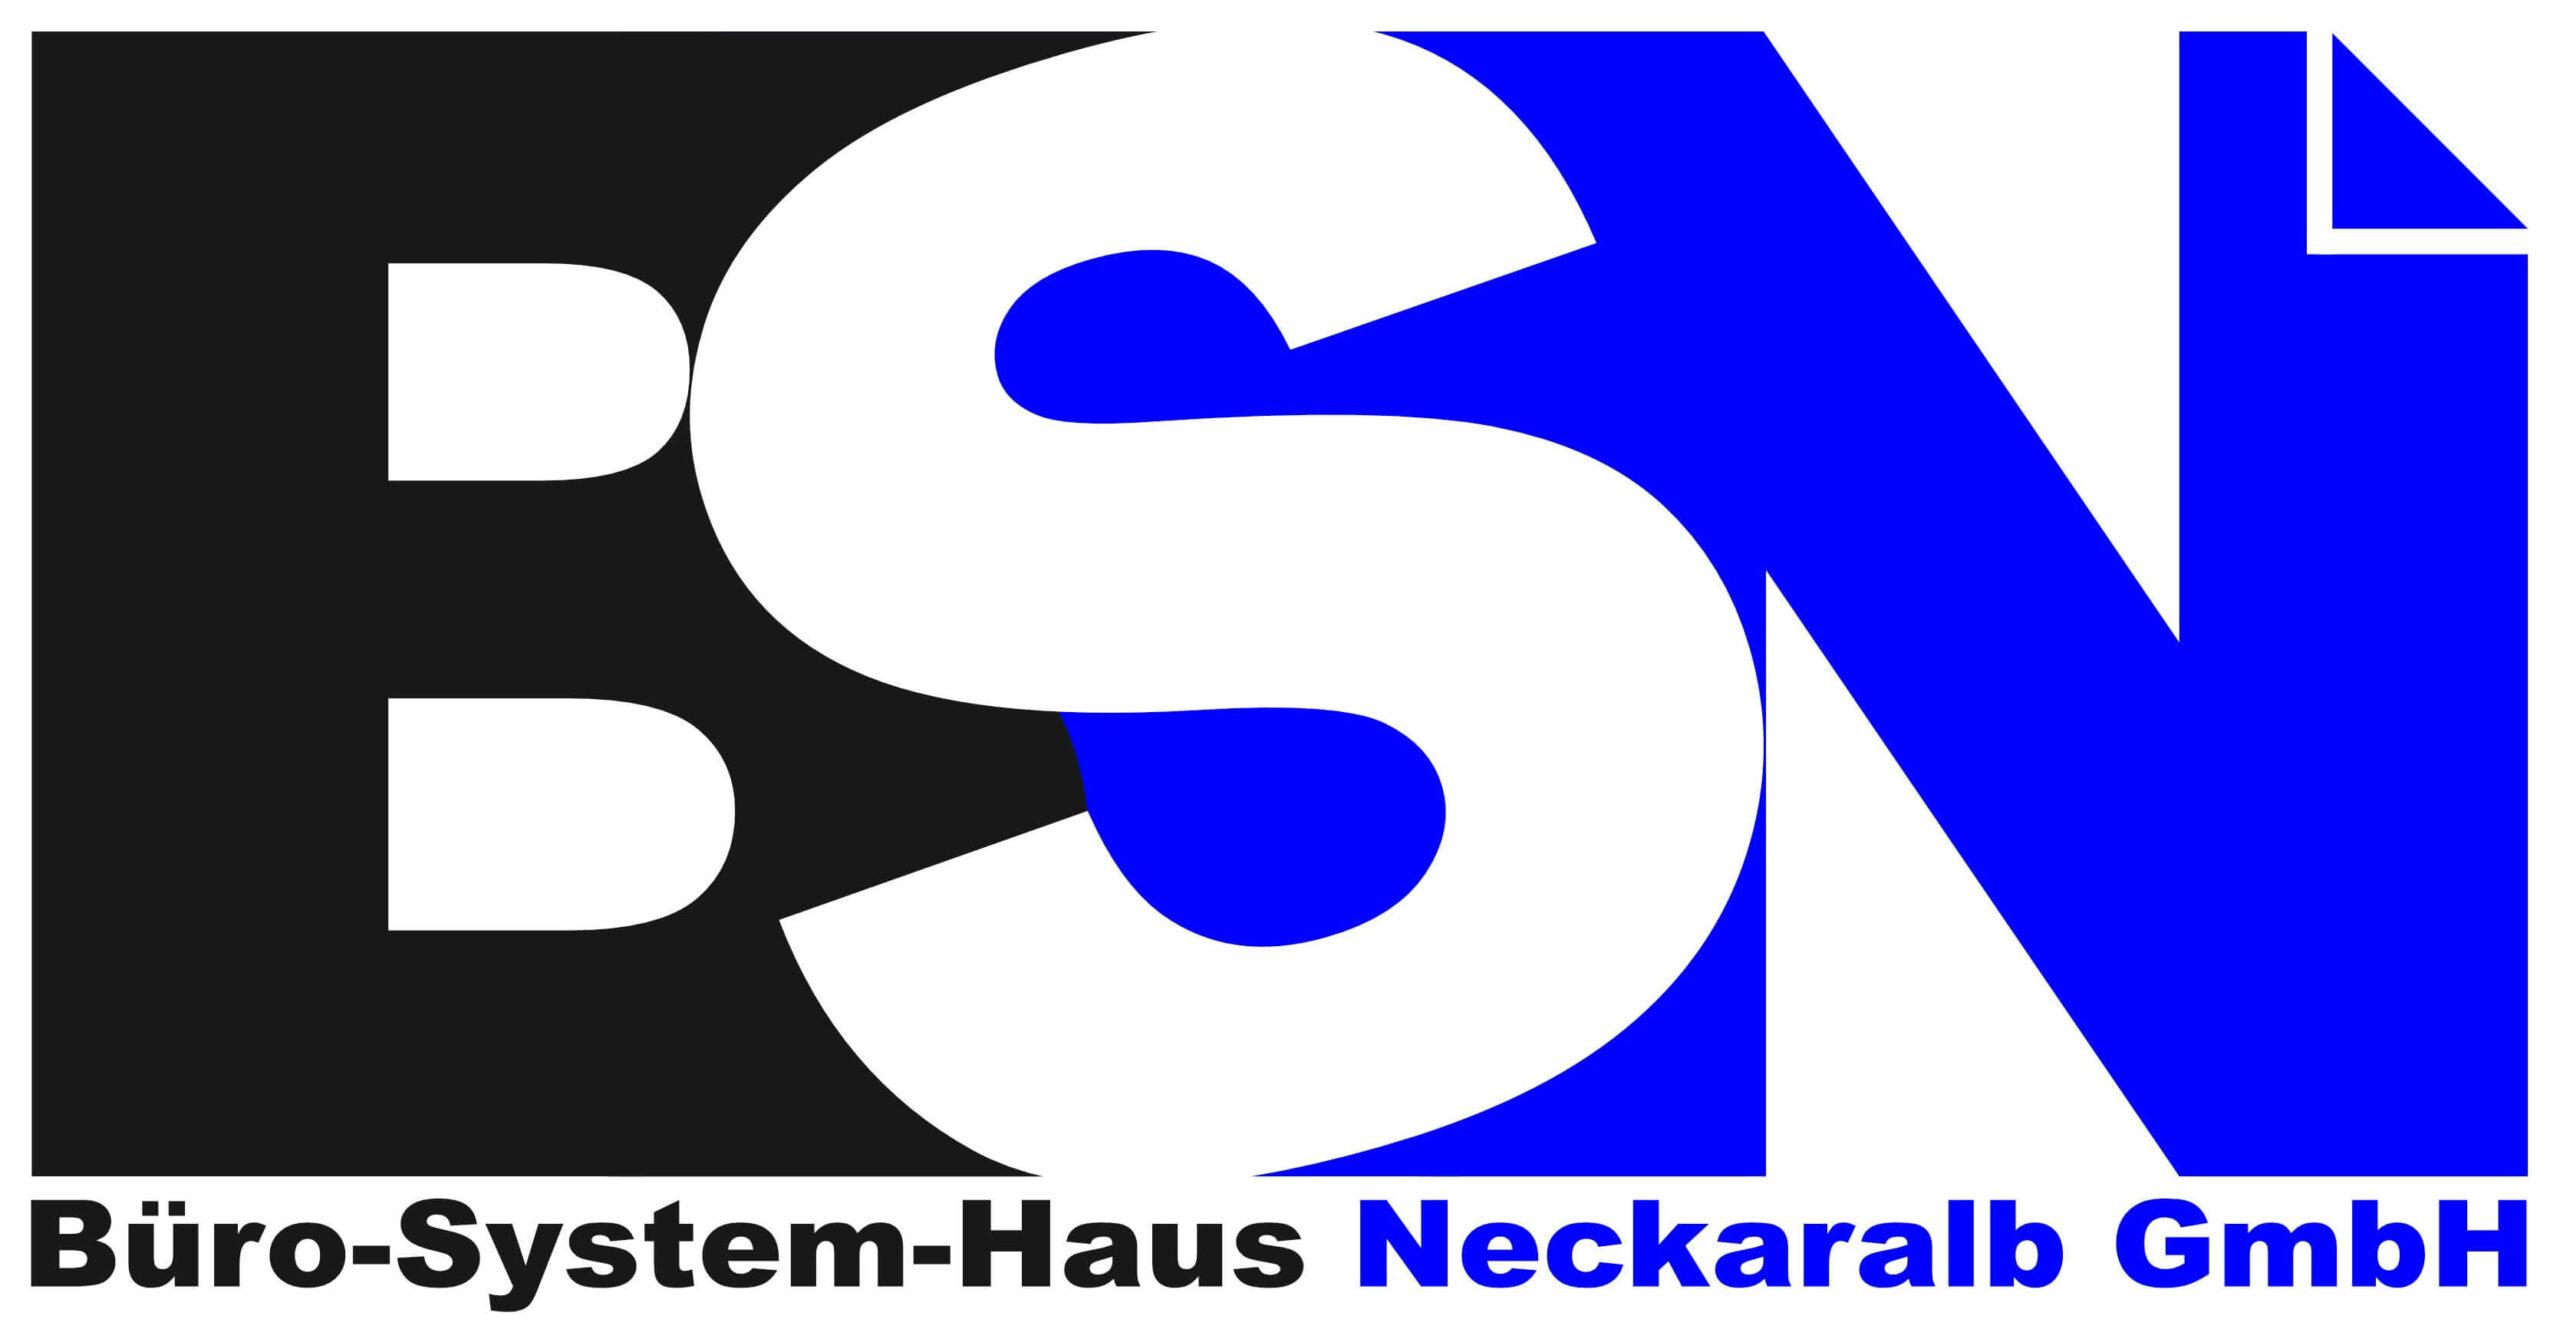 BSN Büro-System-Haus Neckaralb GmbH